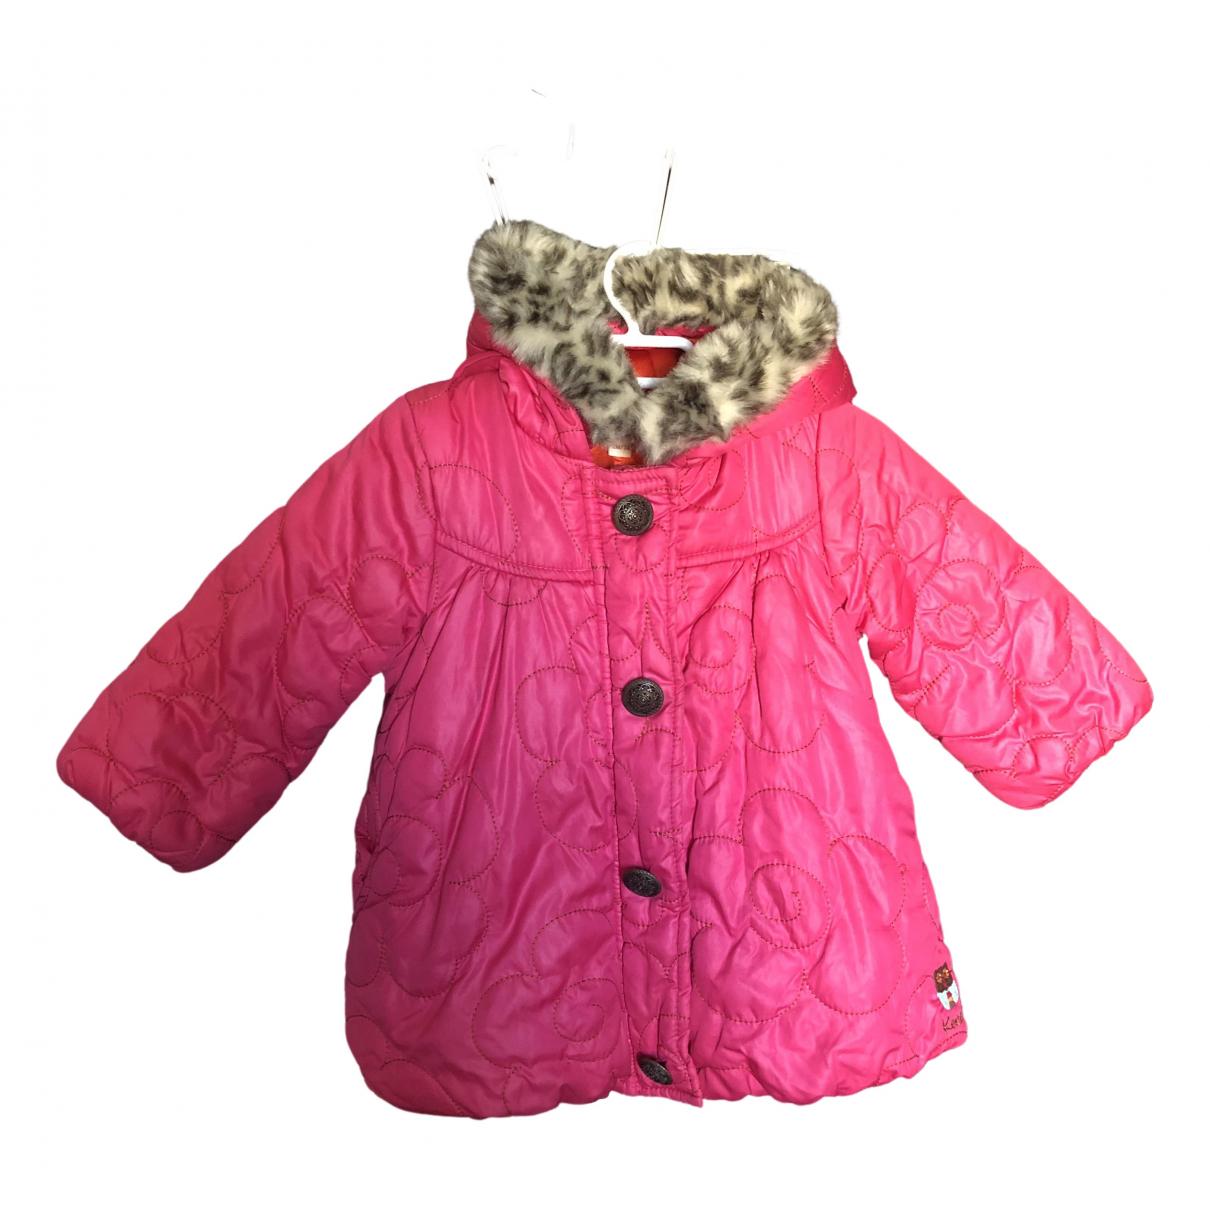 Kenzo \N Pink jacket & coat for Kids 12 months - up to 74cm FR